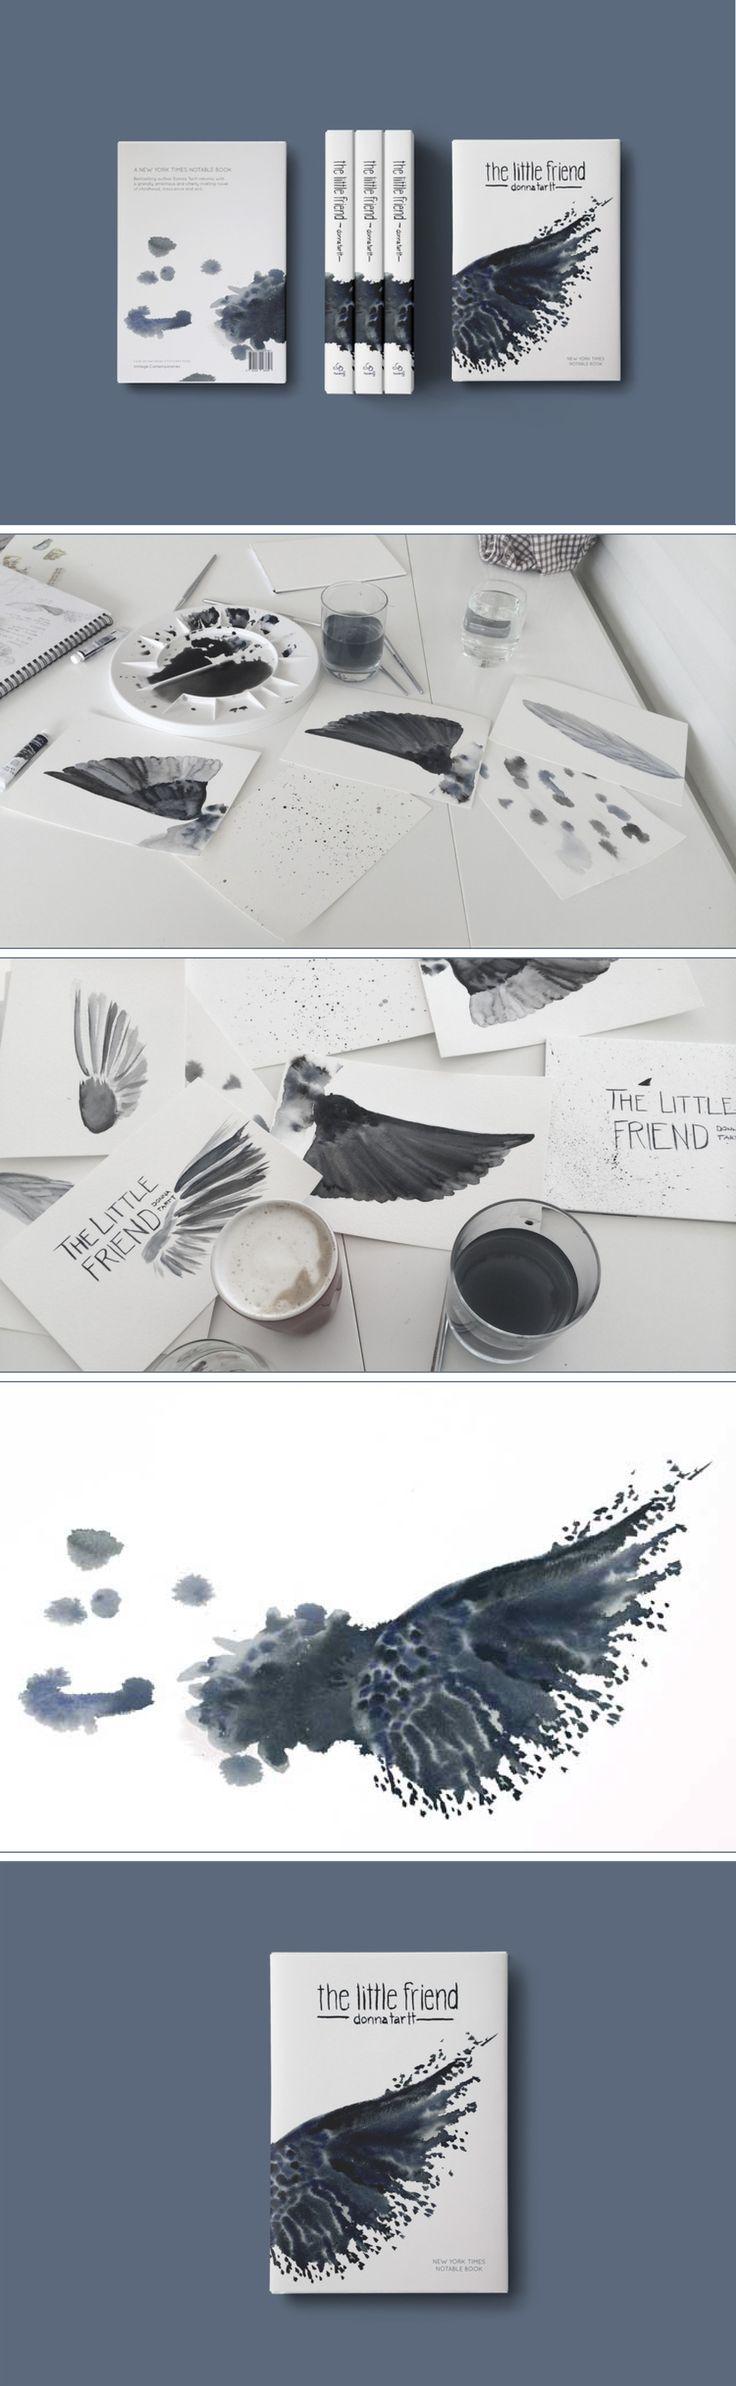 Handmade, The Little Friend, Frankie Young, Shillington graduate..